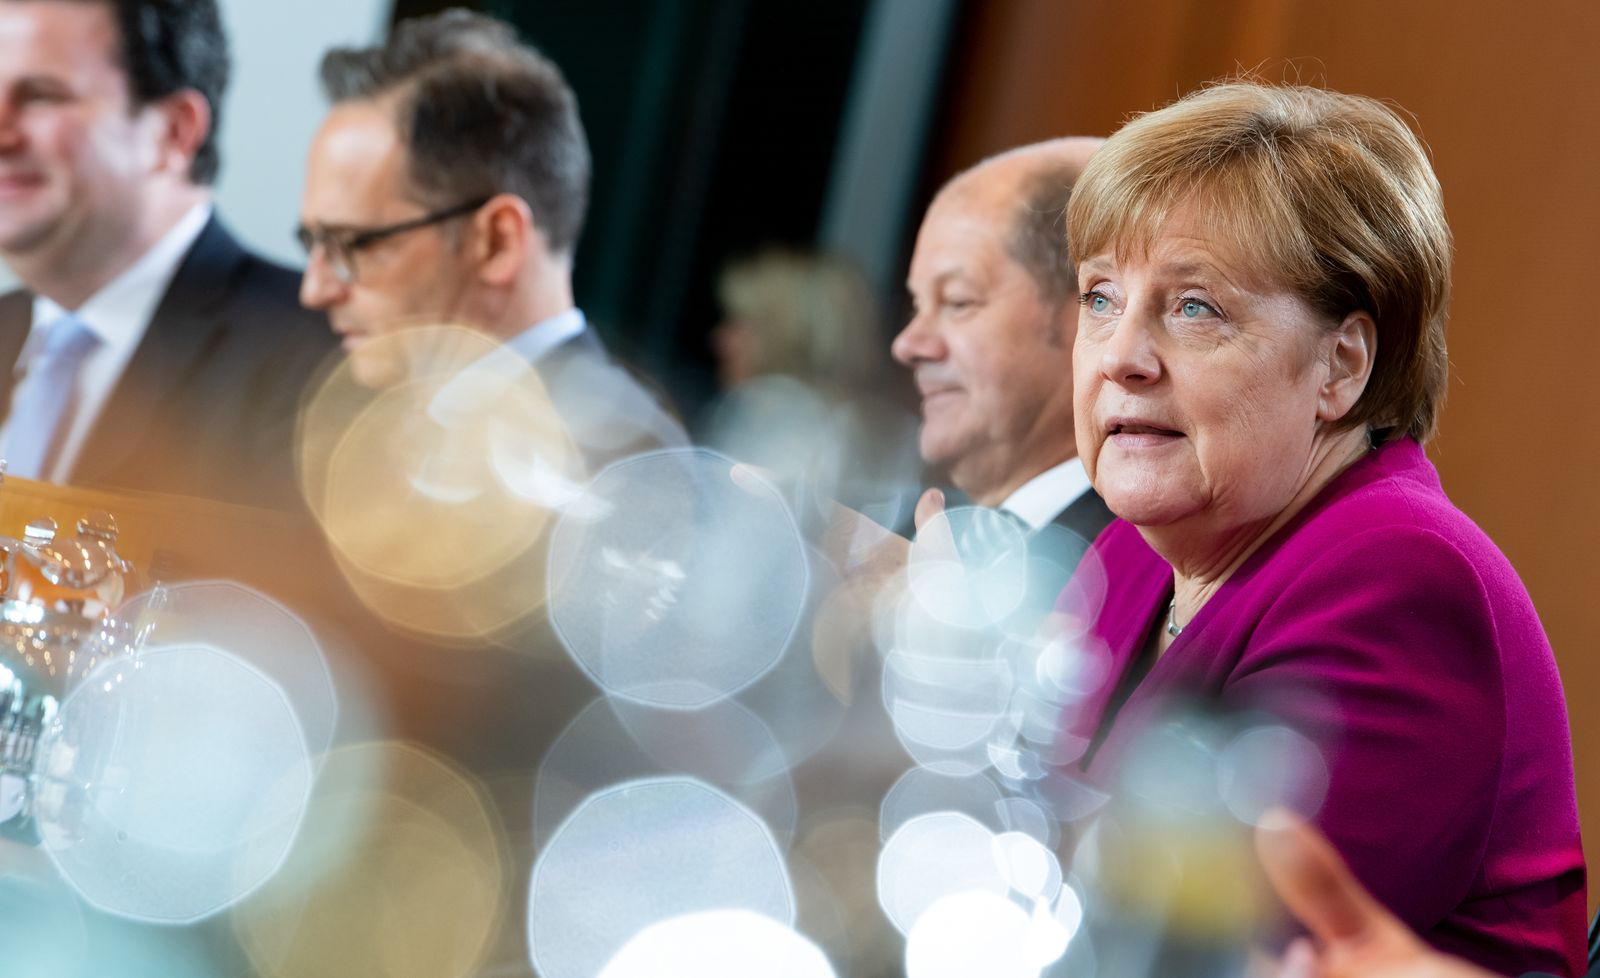 Kabinettssitzung Berlin/ Kabinett 2019/ Merkel Scholz Maas Heil